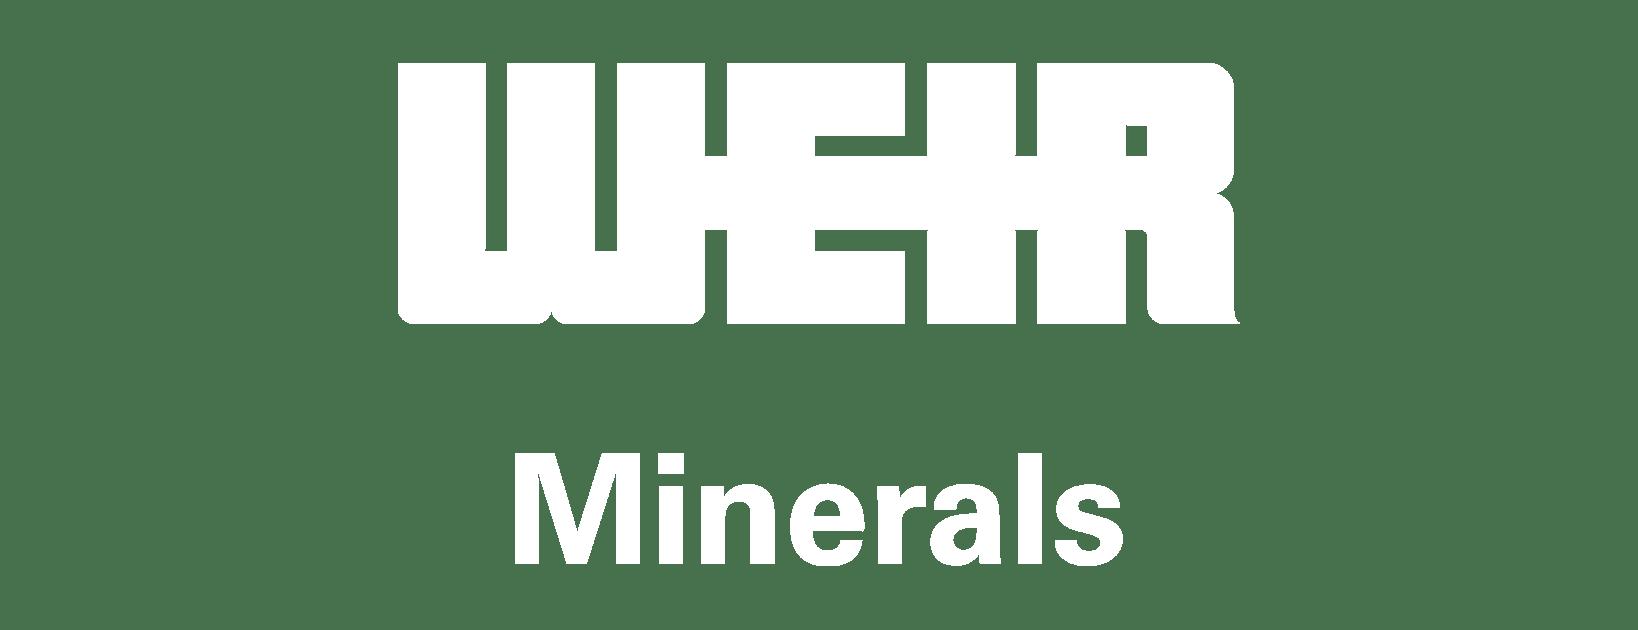 logo_0004_Weir_Minerals_Vertical-Centre_201610_RGB-1